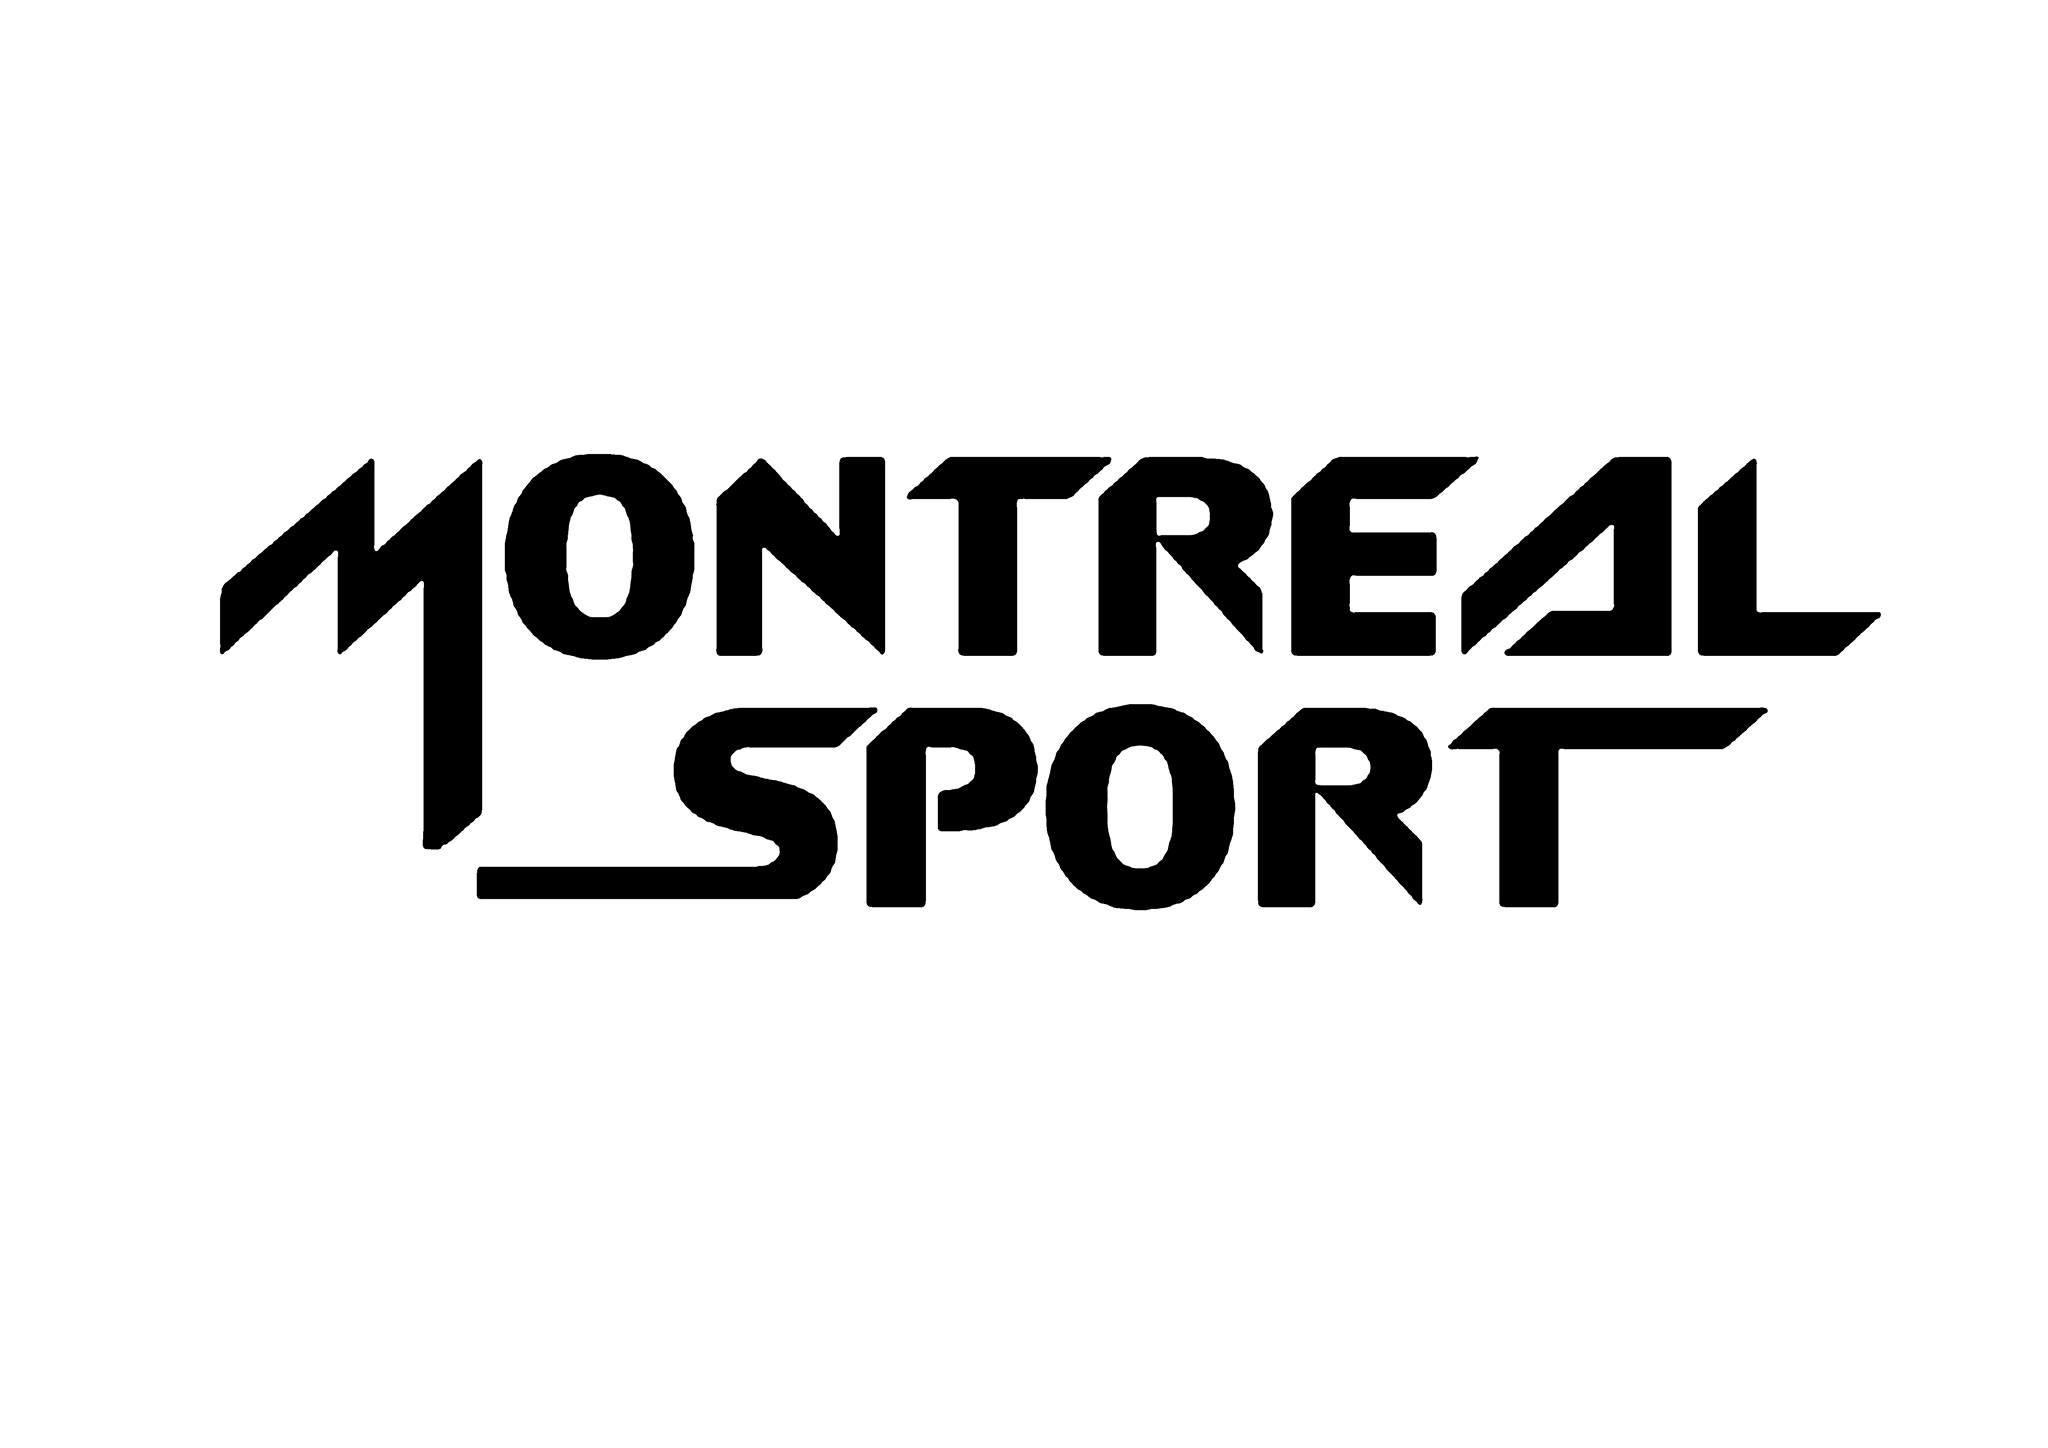 Montreal Sport